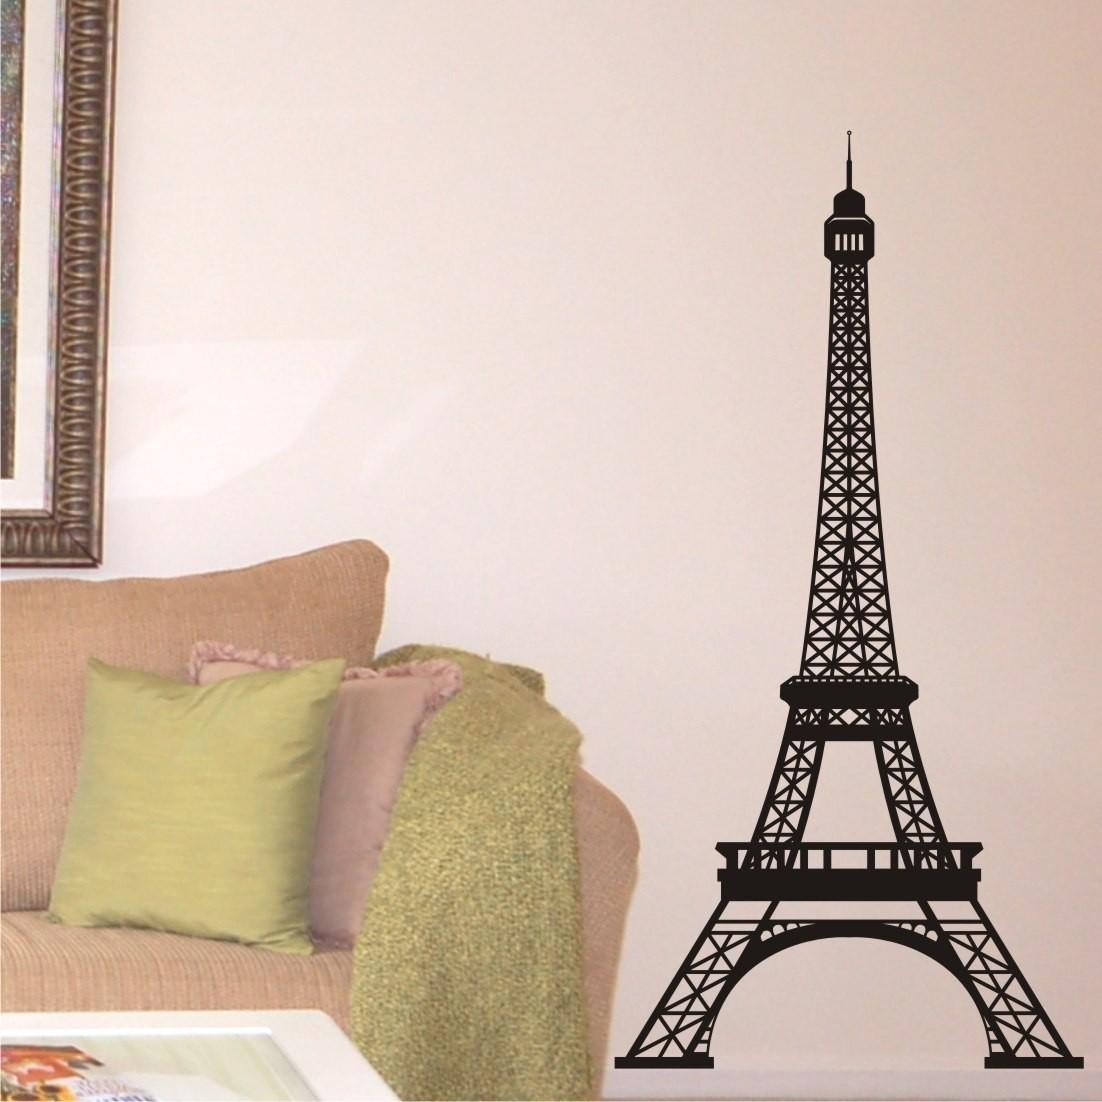 Wall Decor Eiffel Tower | New Interior Design Regarding Eiffel Tower Wall Art (View 4 of 20)